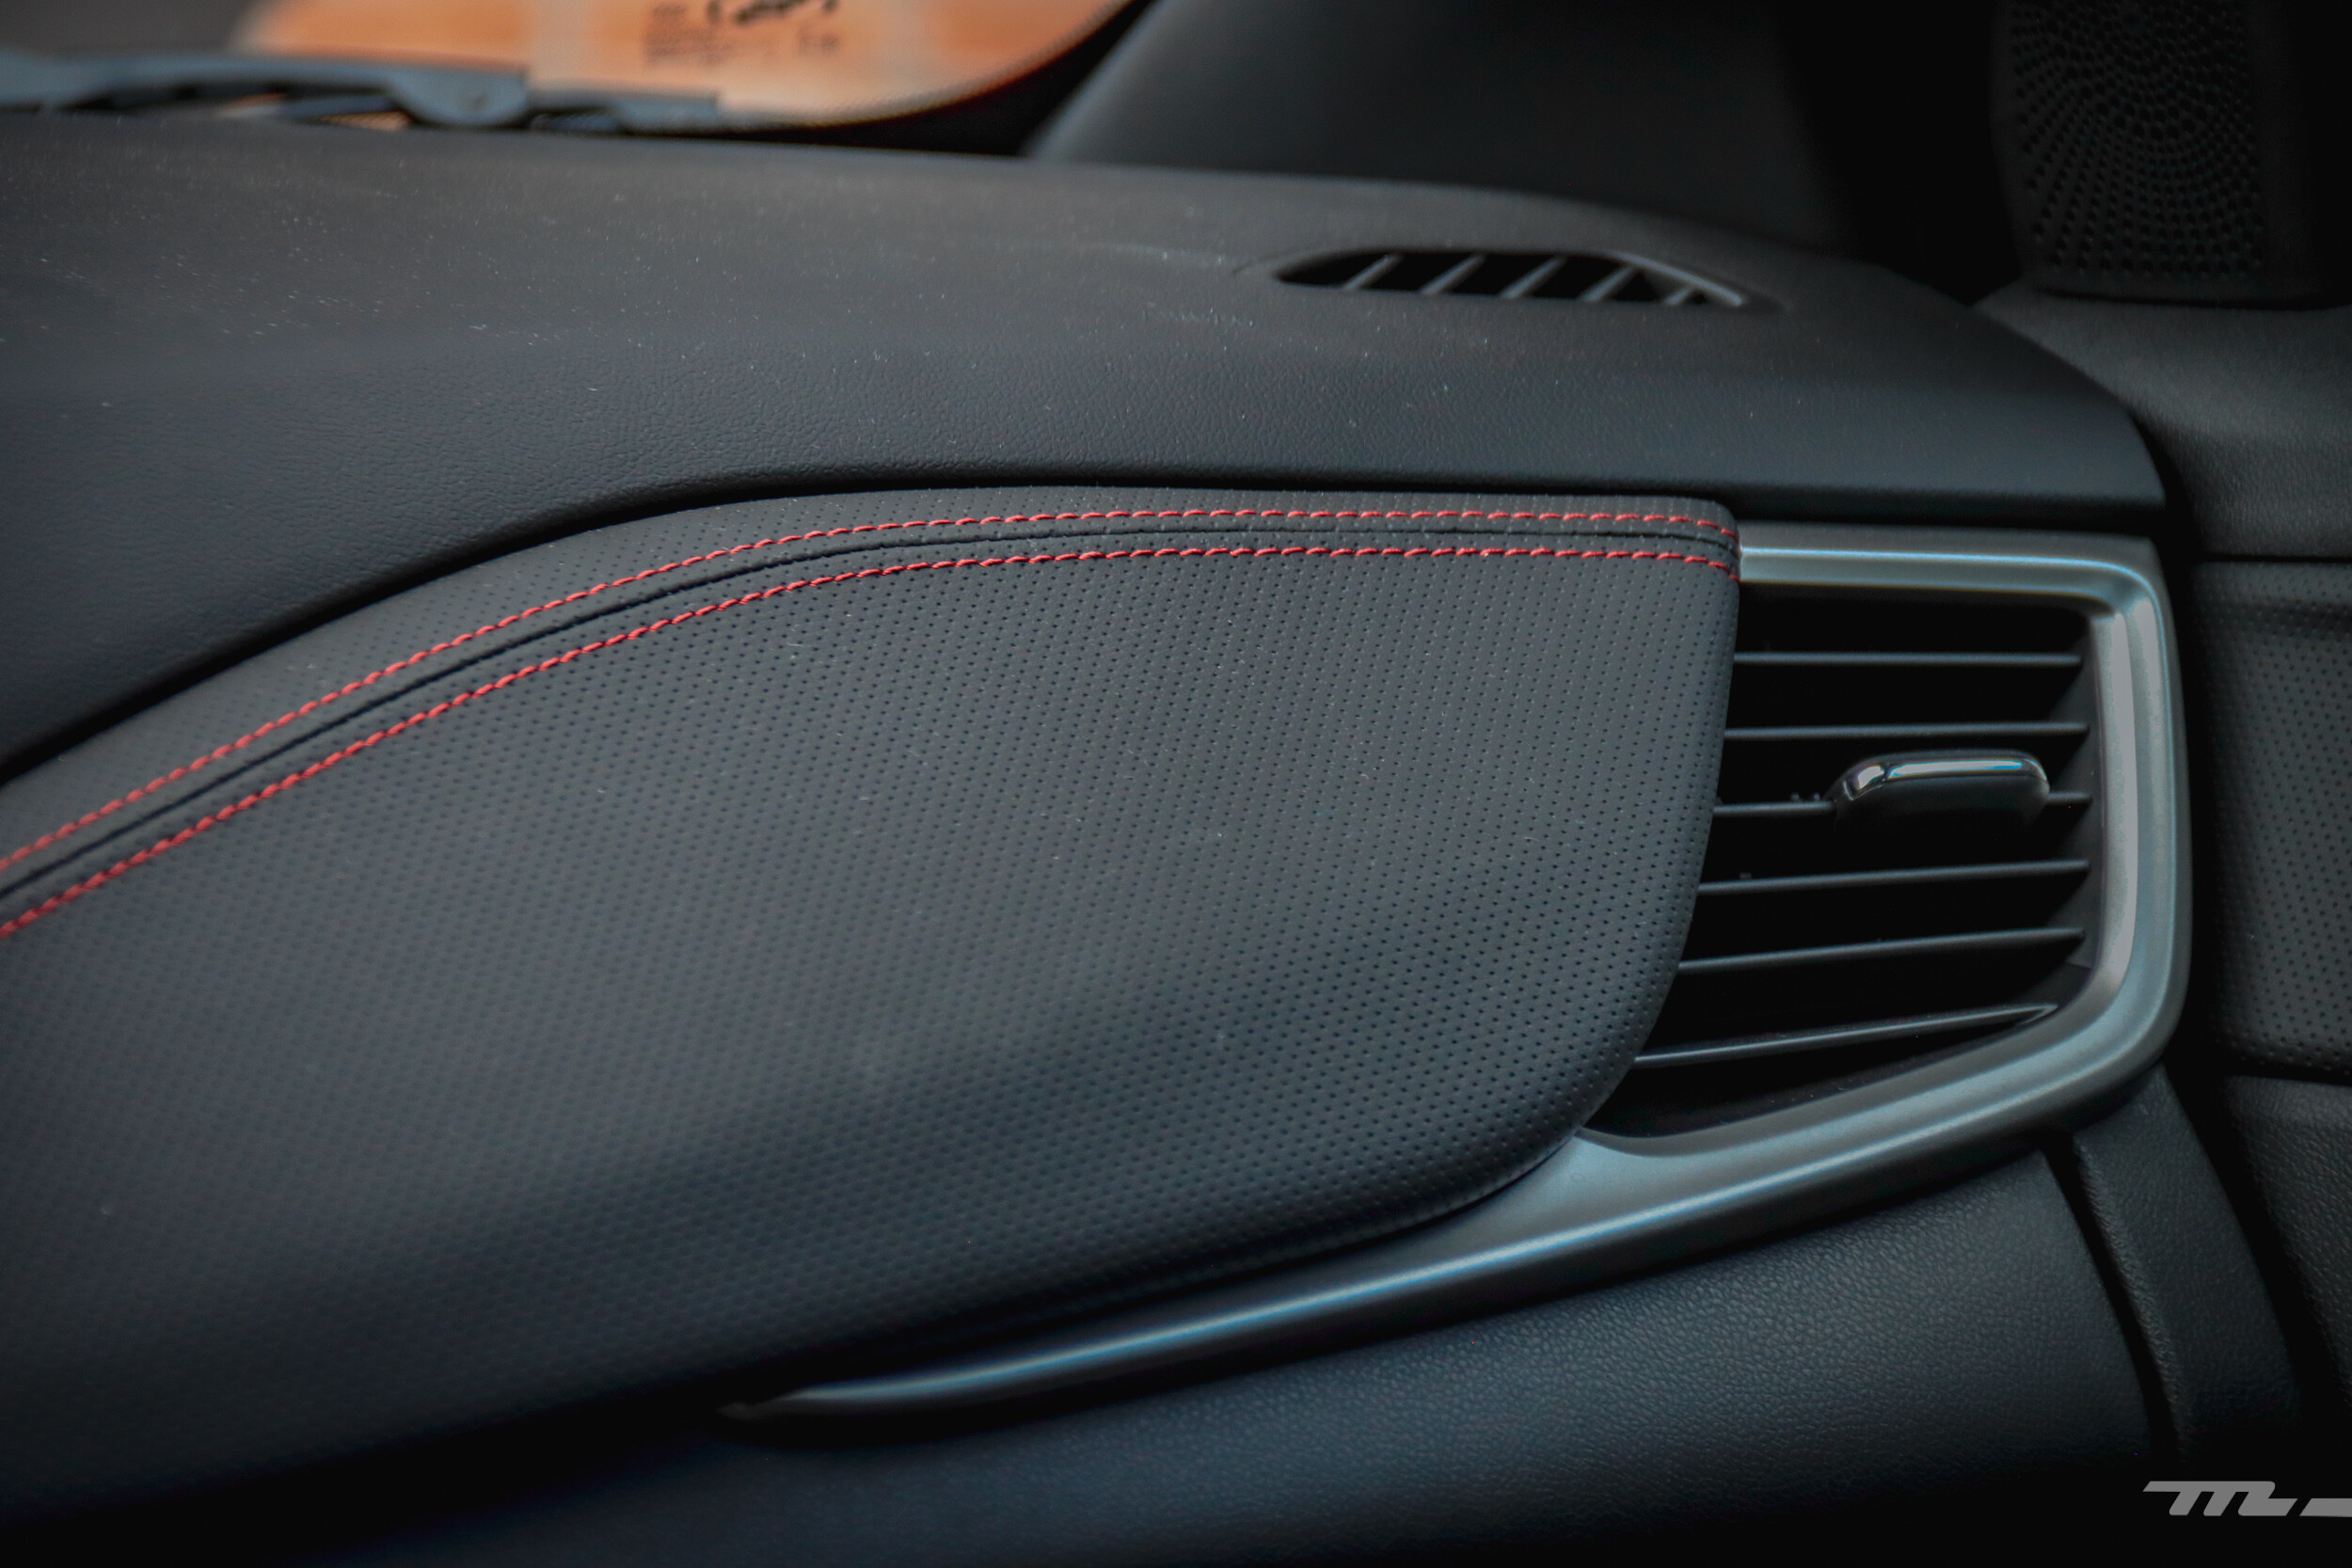 Foto de Chevrolet Cavalier Turbo 2022: Primer vistazo (31/37)